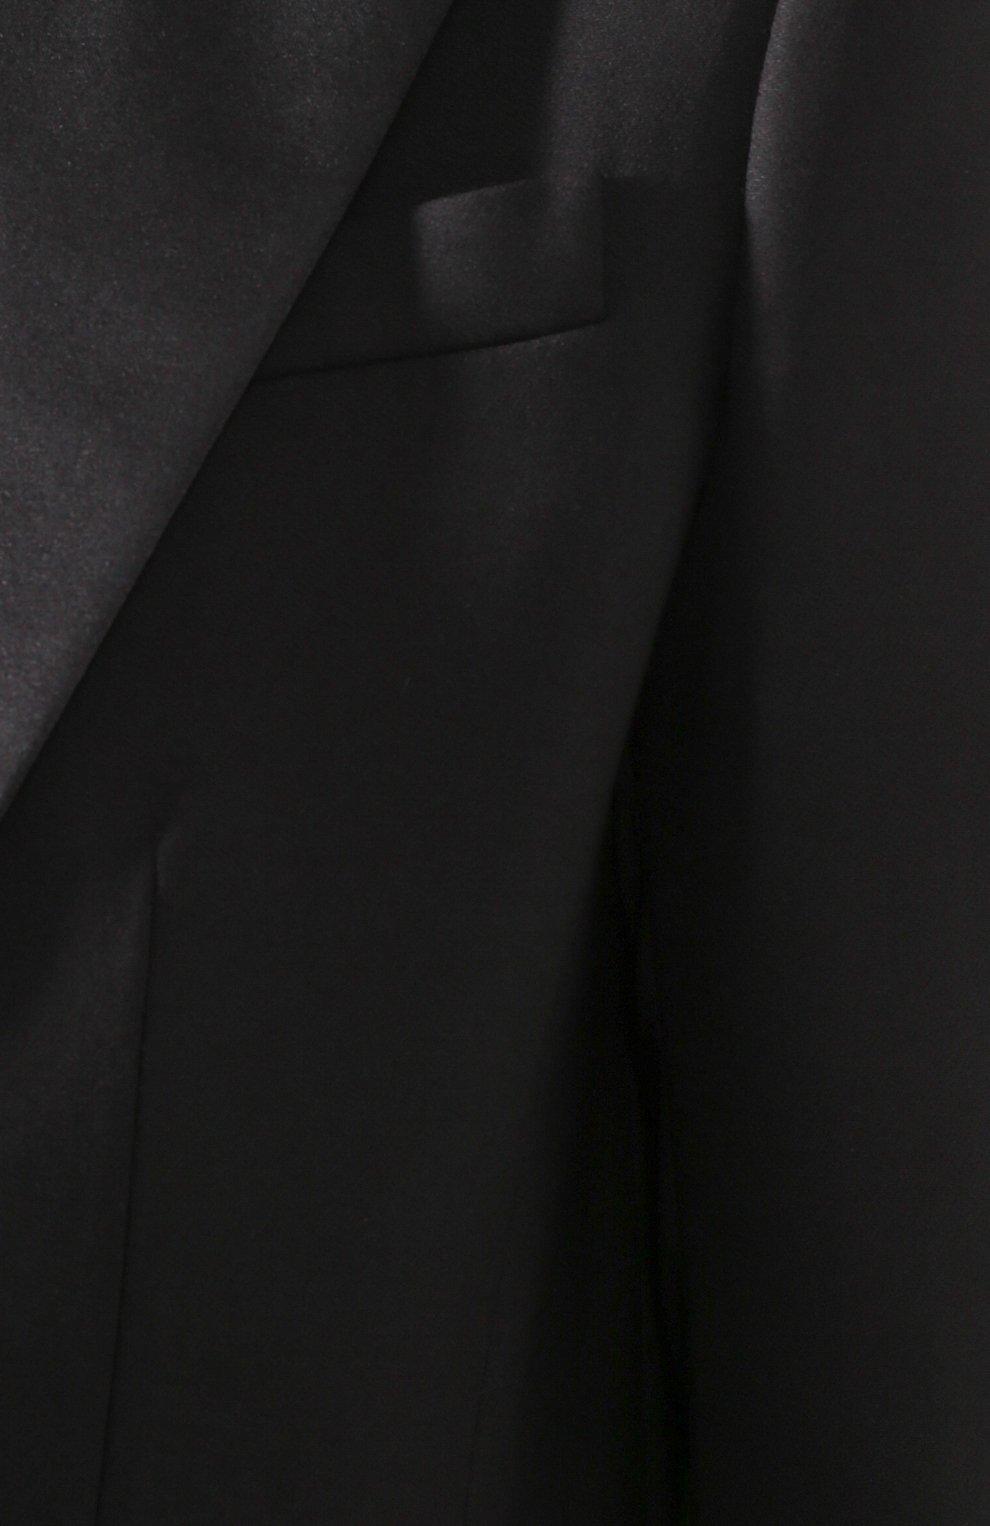 Женский жакет из смеси шерсти и шелка ALEXANDER MCQUEEN черного цвета, арт. 612810/QJAAA | Фото 5